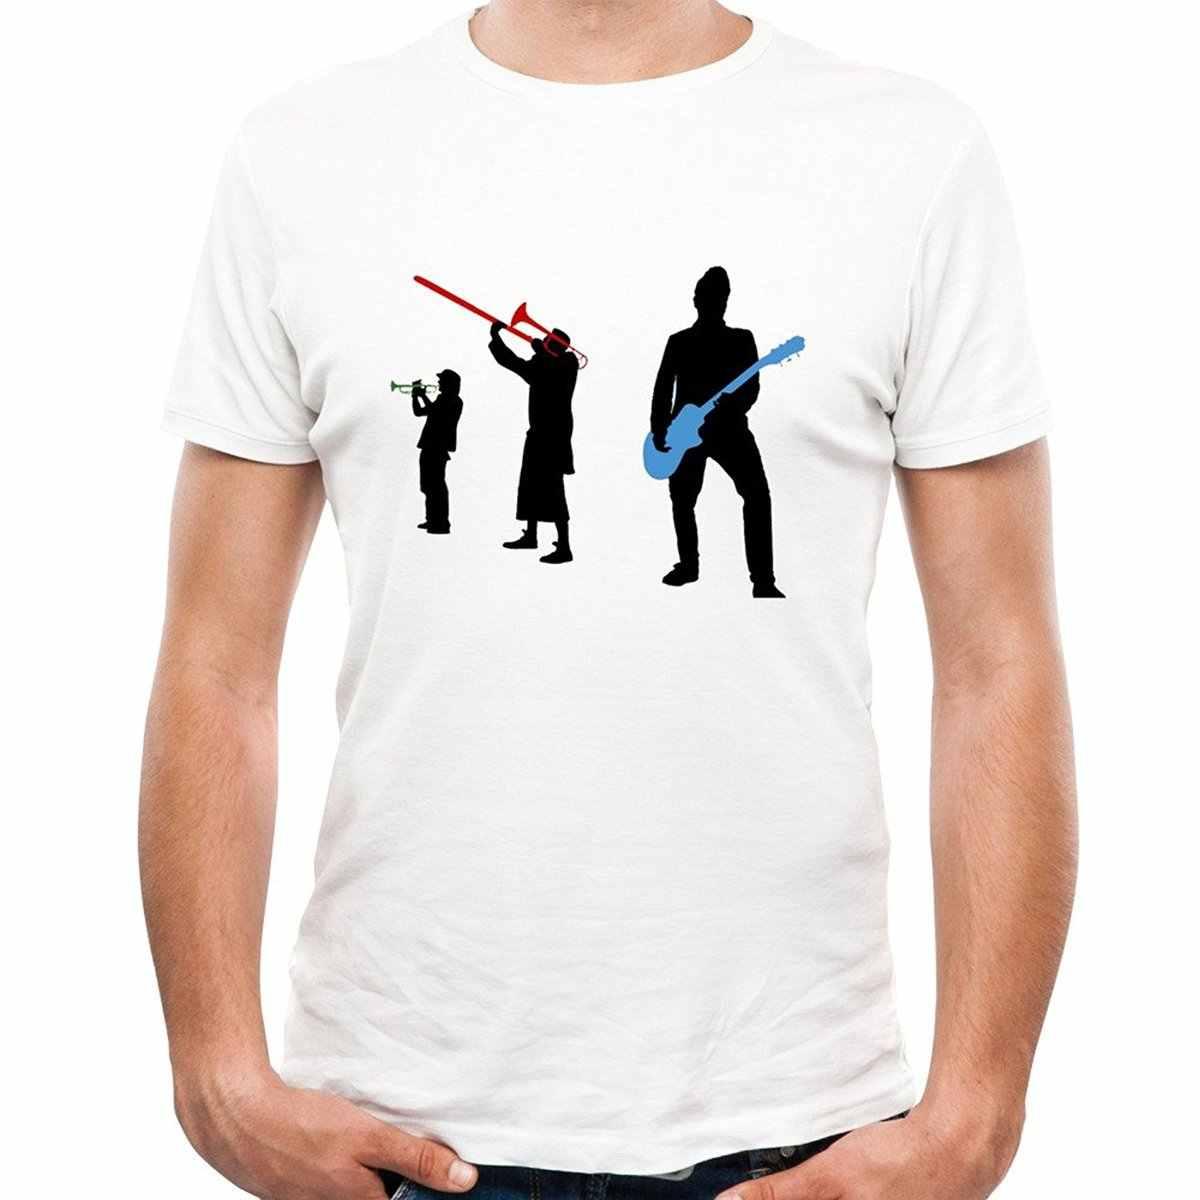 Fashion T Shirt Free Shipping Men'S Short Sleeve Office Reel Big Fish Puck Bandell Out Short Crew Neck T Shirts